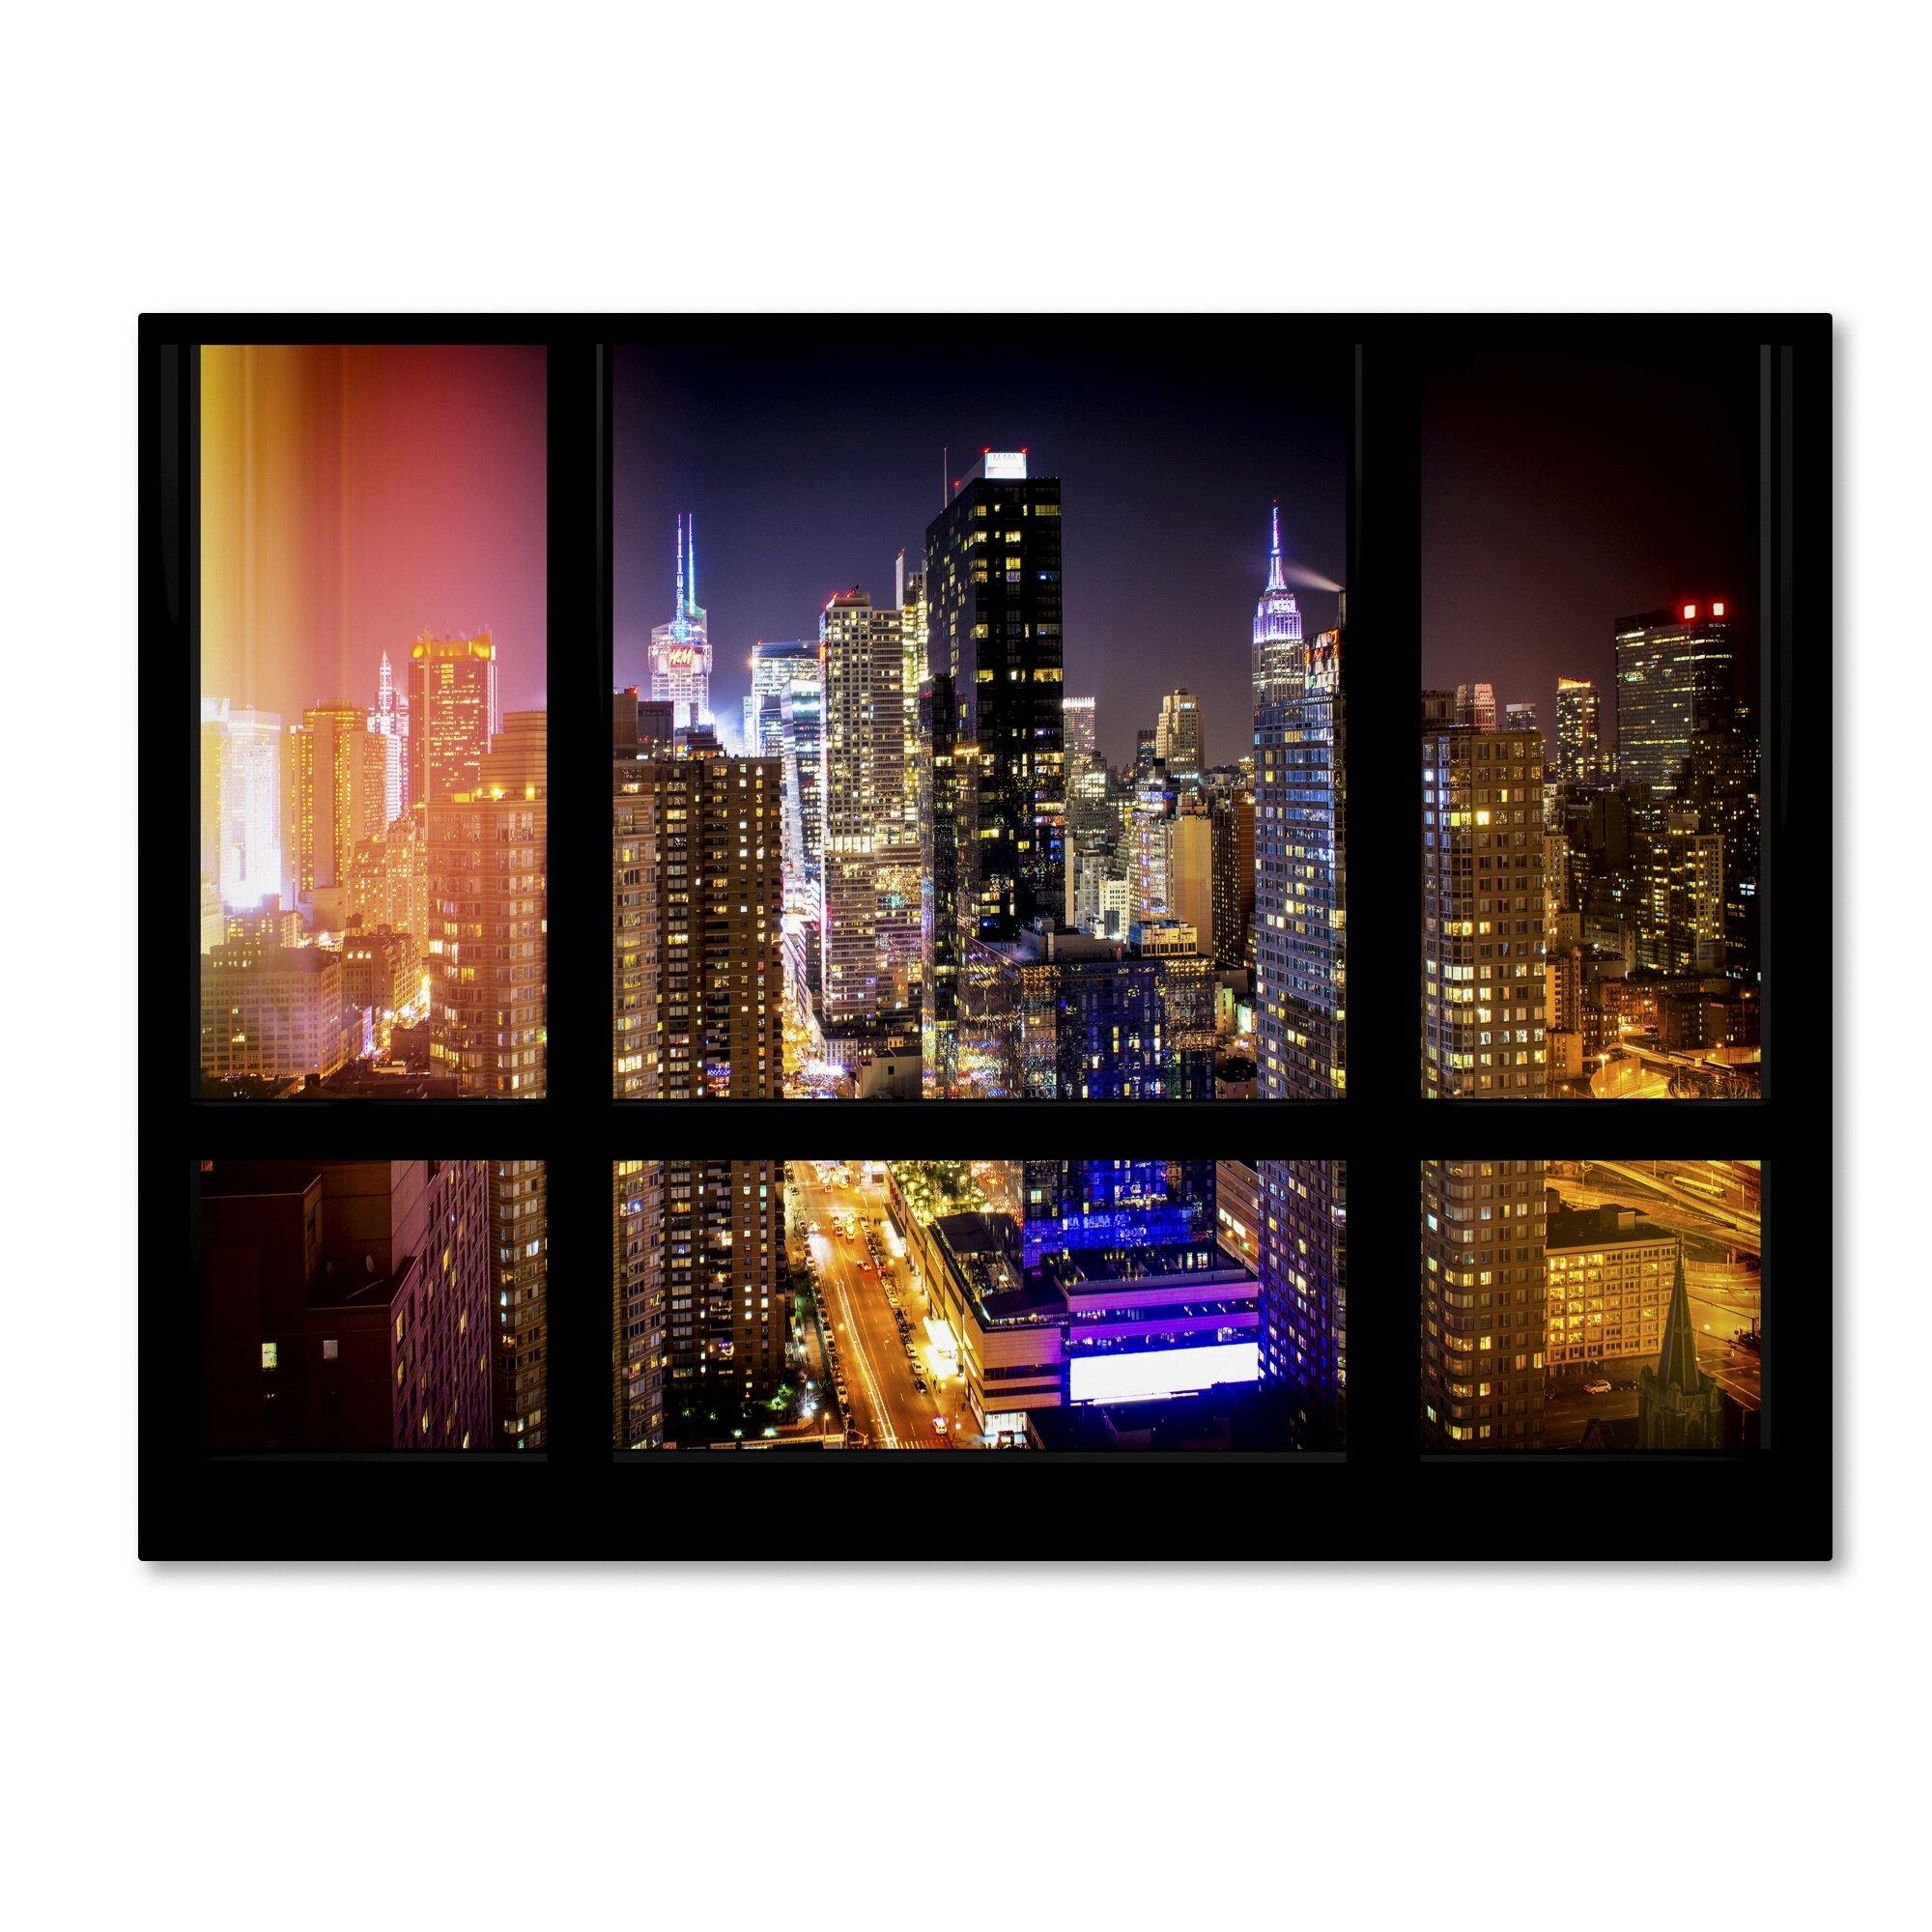 Trademark Art Window View Manhattan Night 2 Framed Photographic Print On Wrapped Canvas Wayfair